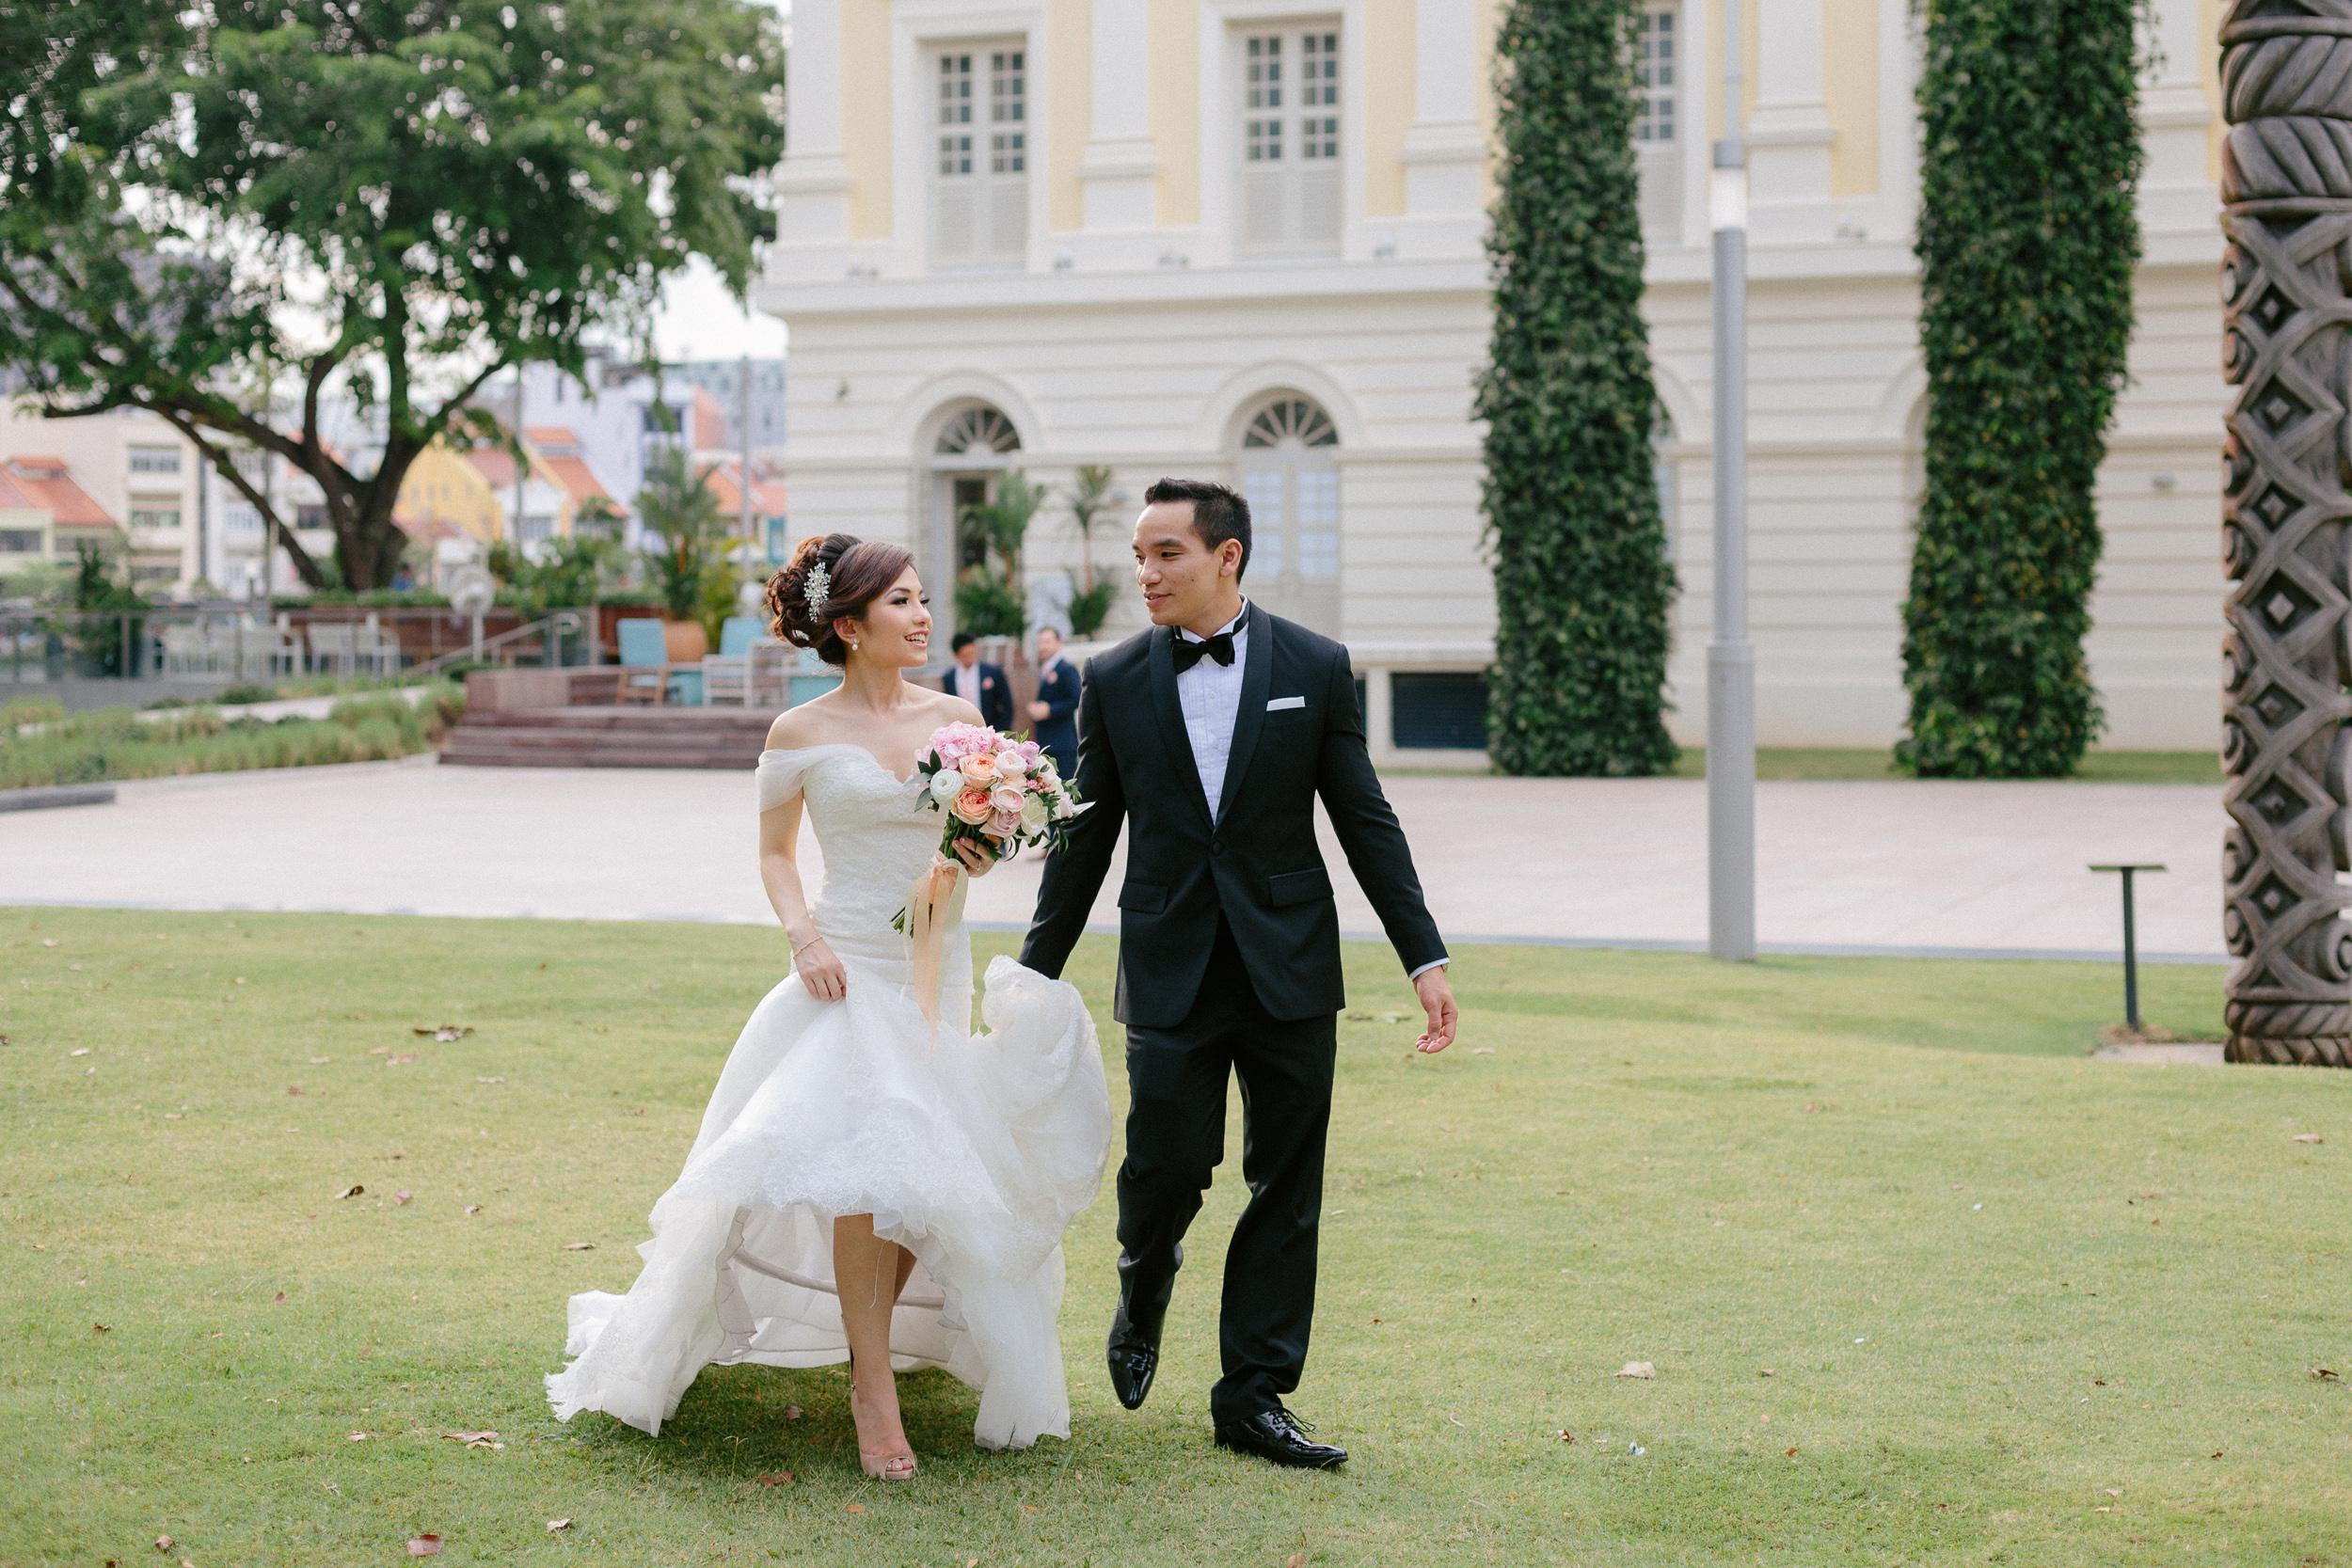 singapore-wedding-photographer-cheryl-matthew-fullerton-hotel-wedding-46.jpg